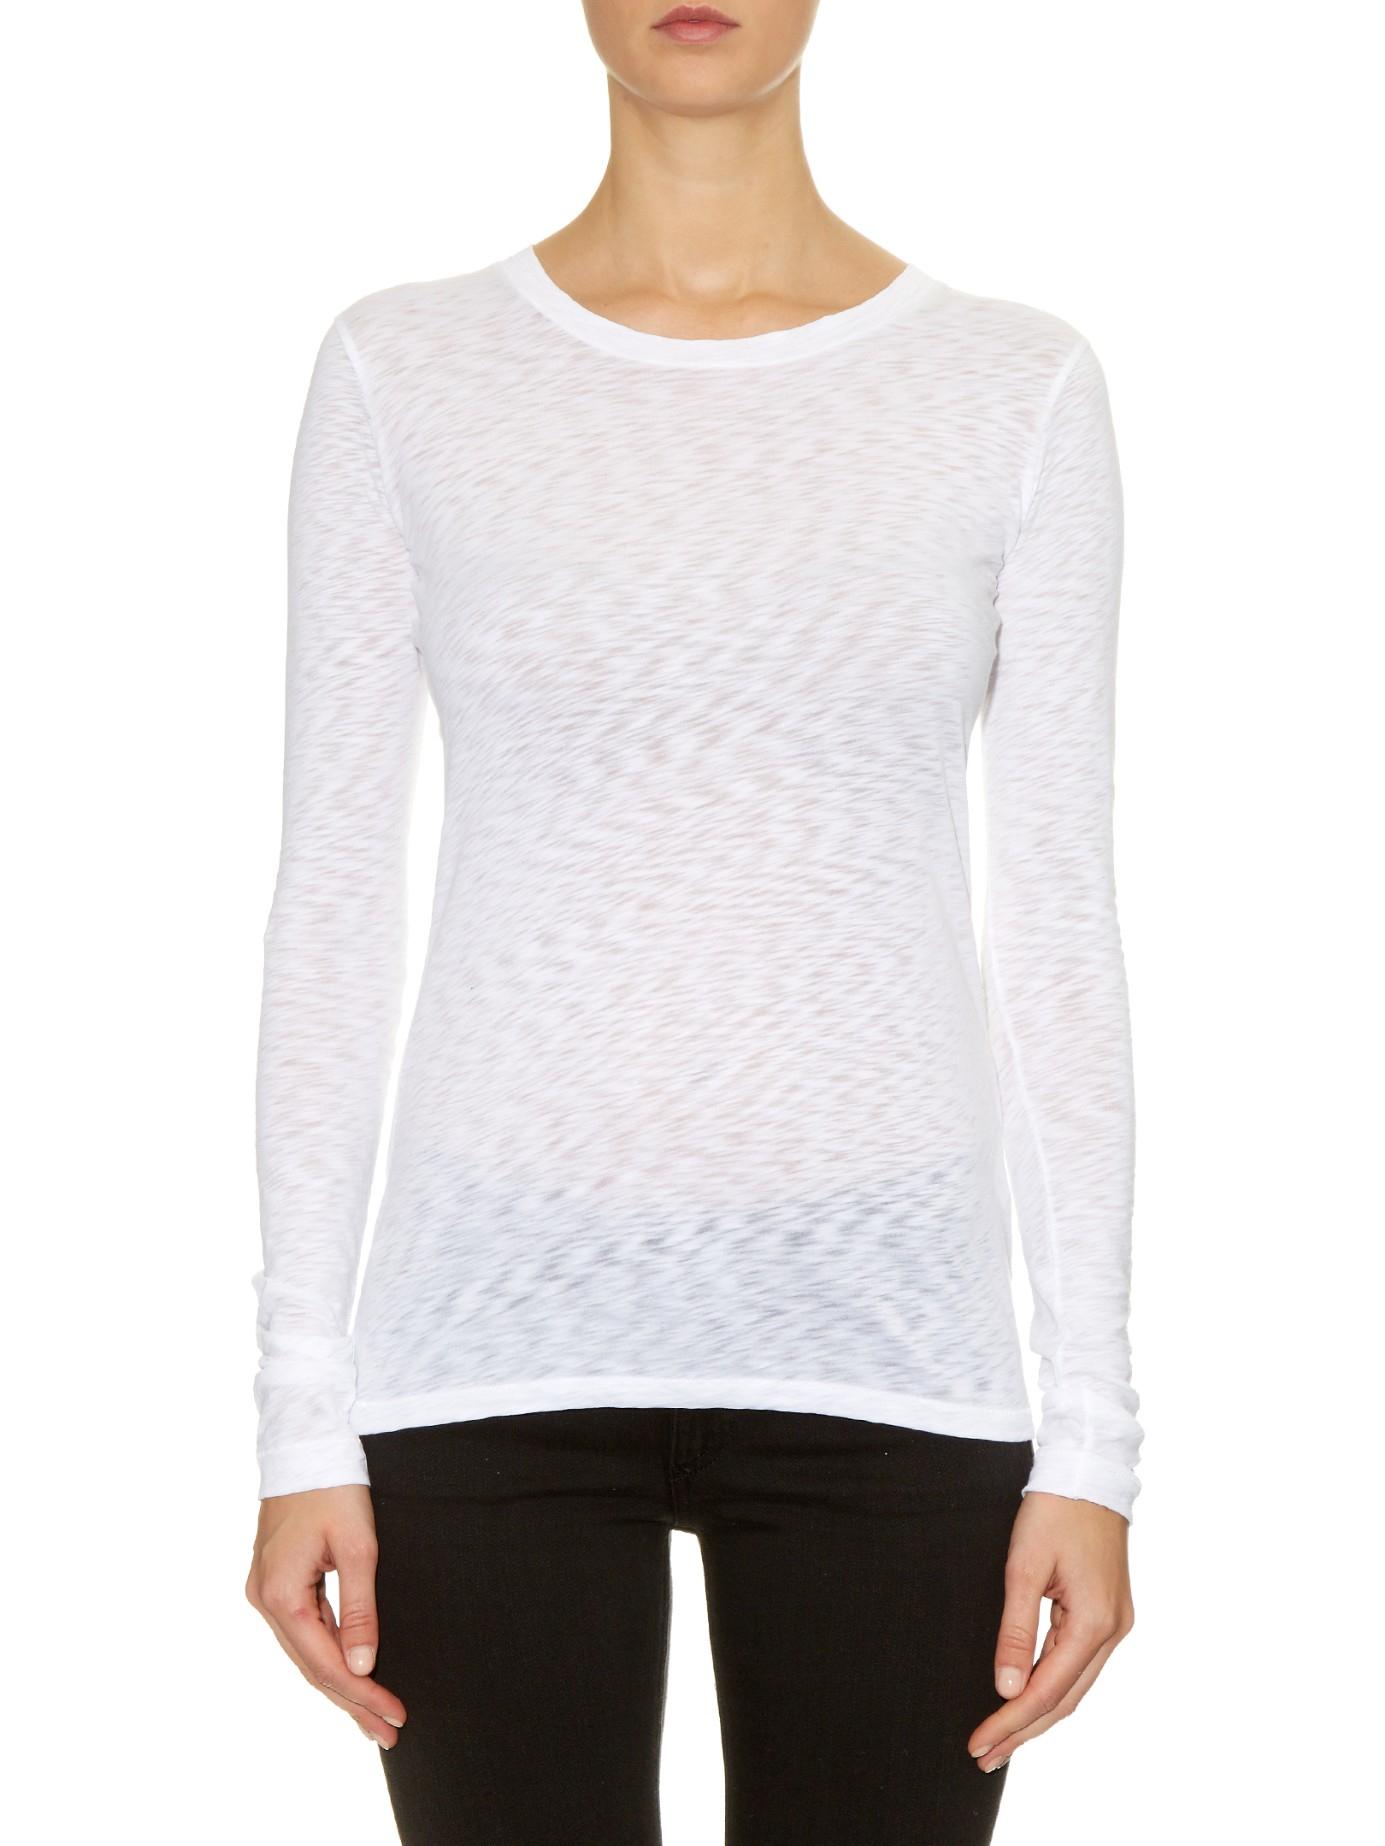 Lyst rag bone the classic long sleeved t shirt in white for Rag and bone white t shirt